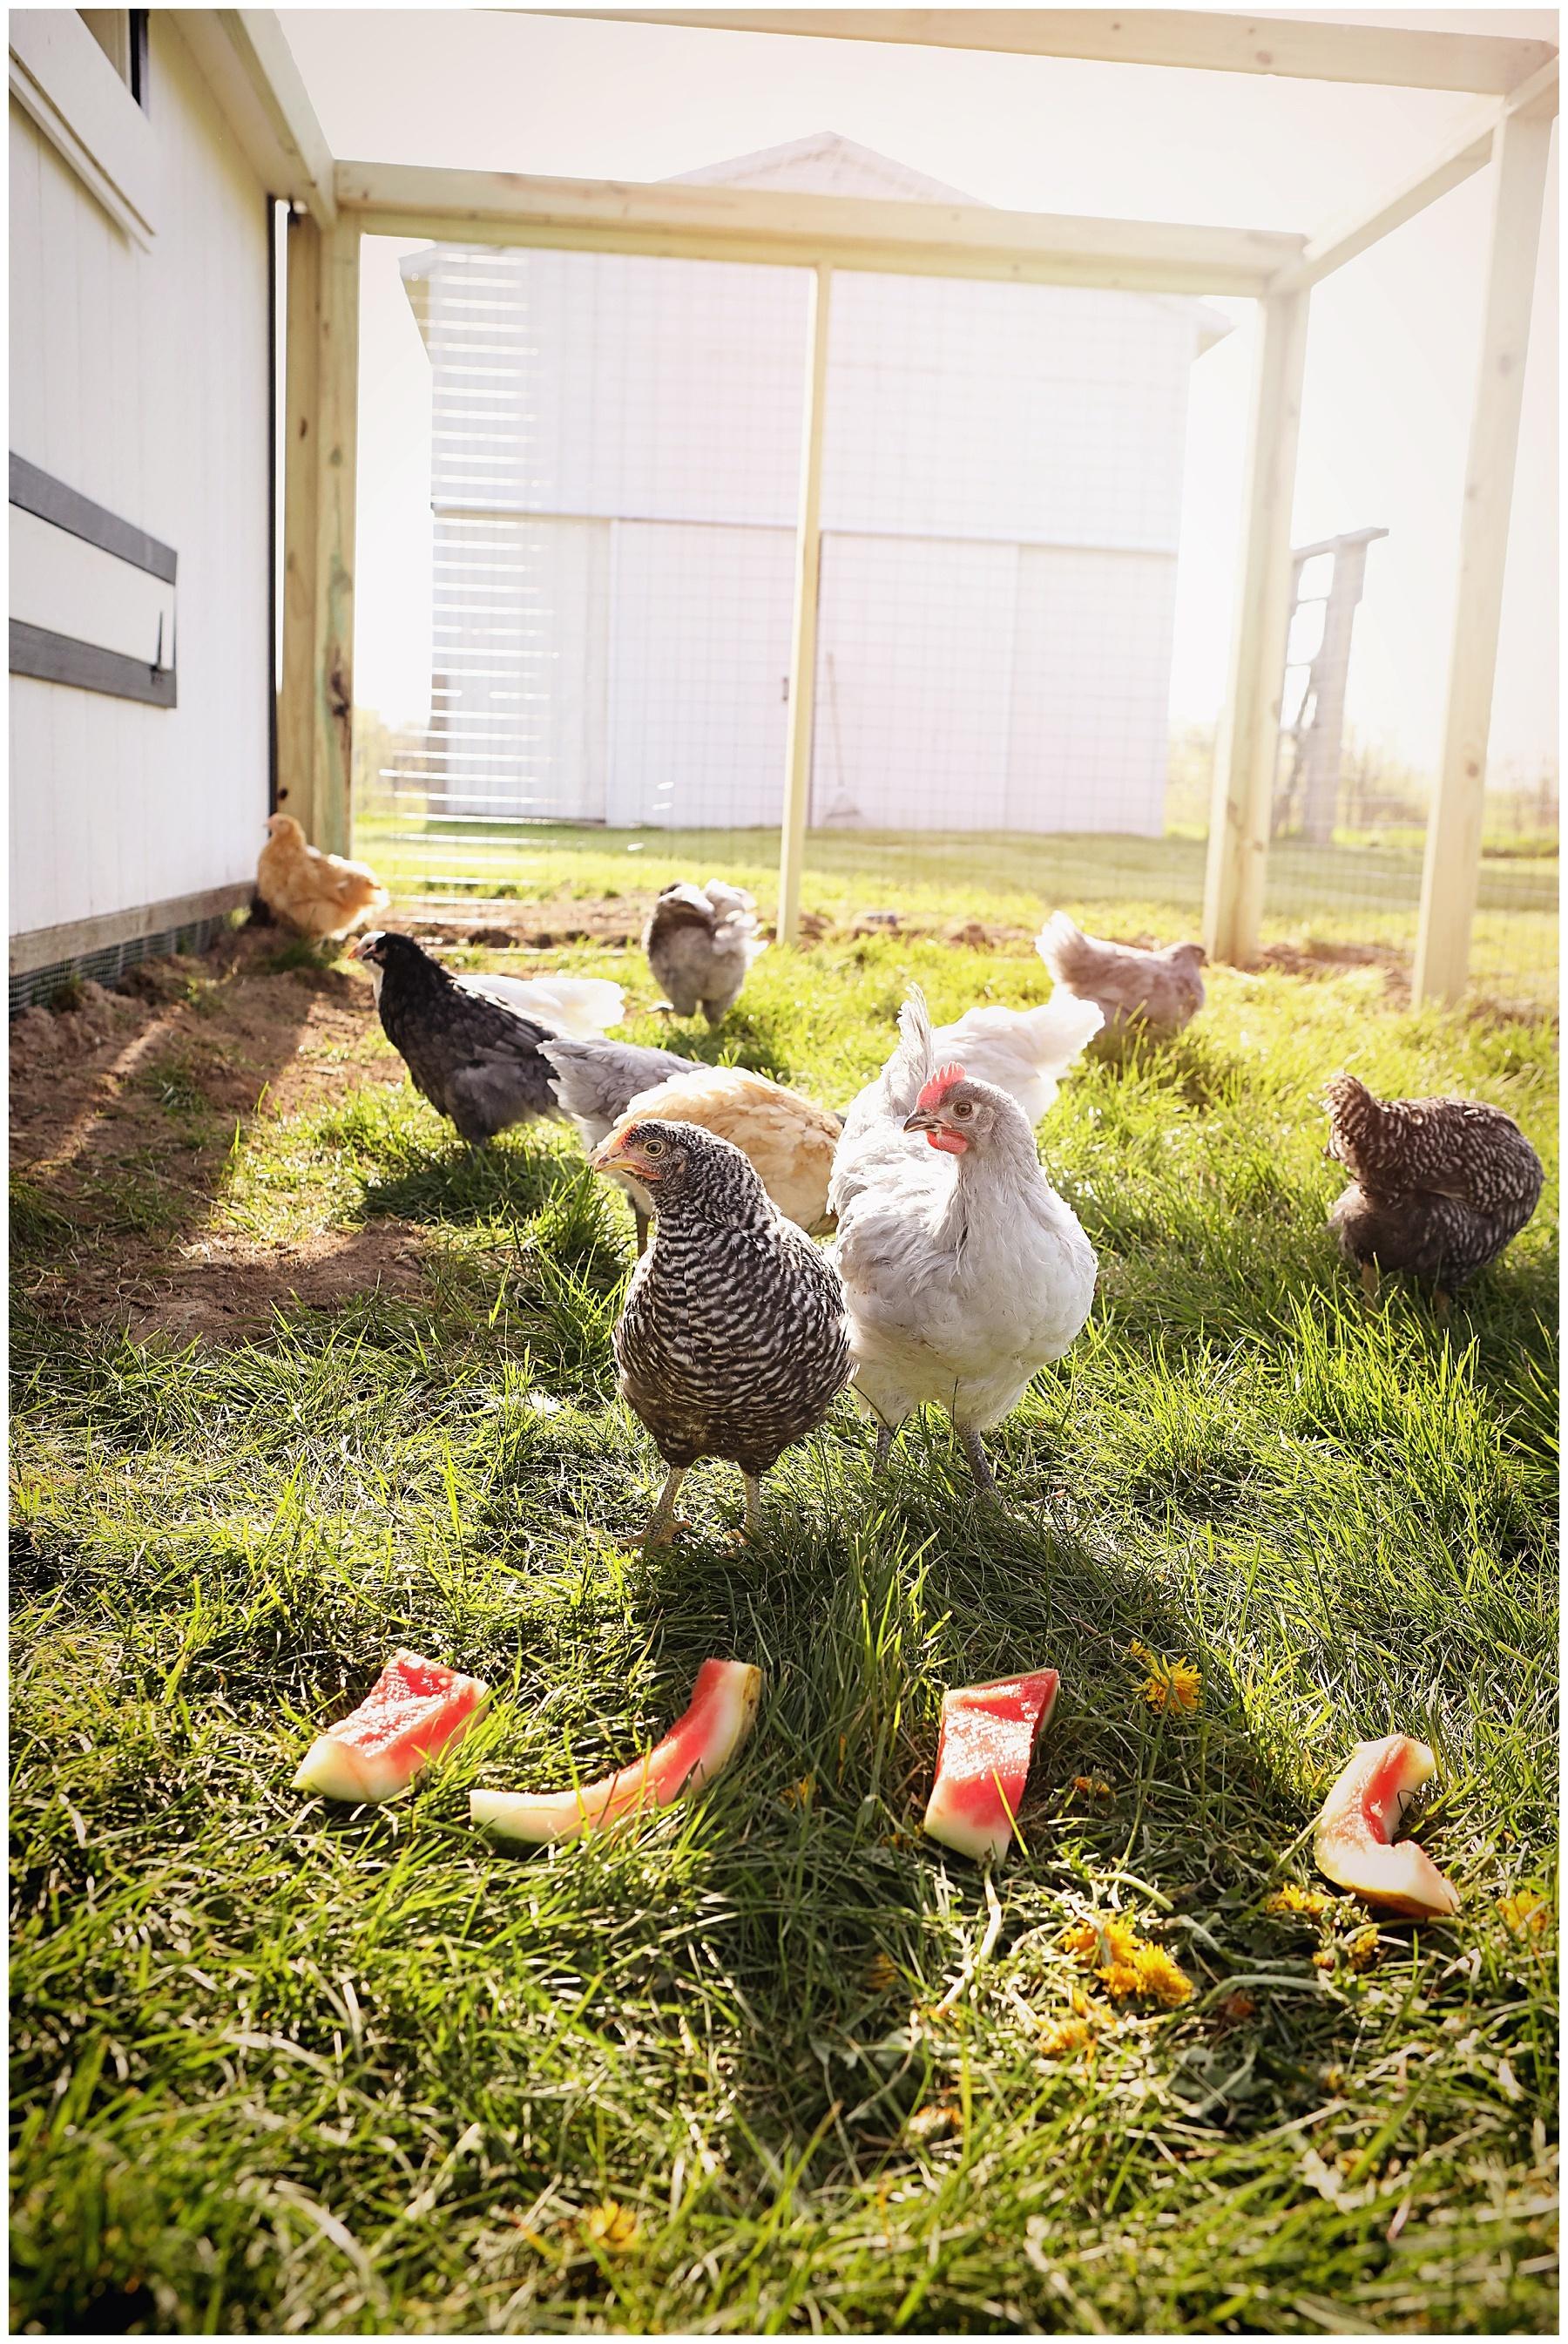 Chicken coop with run tour